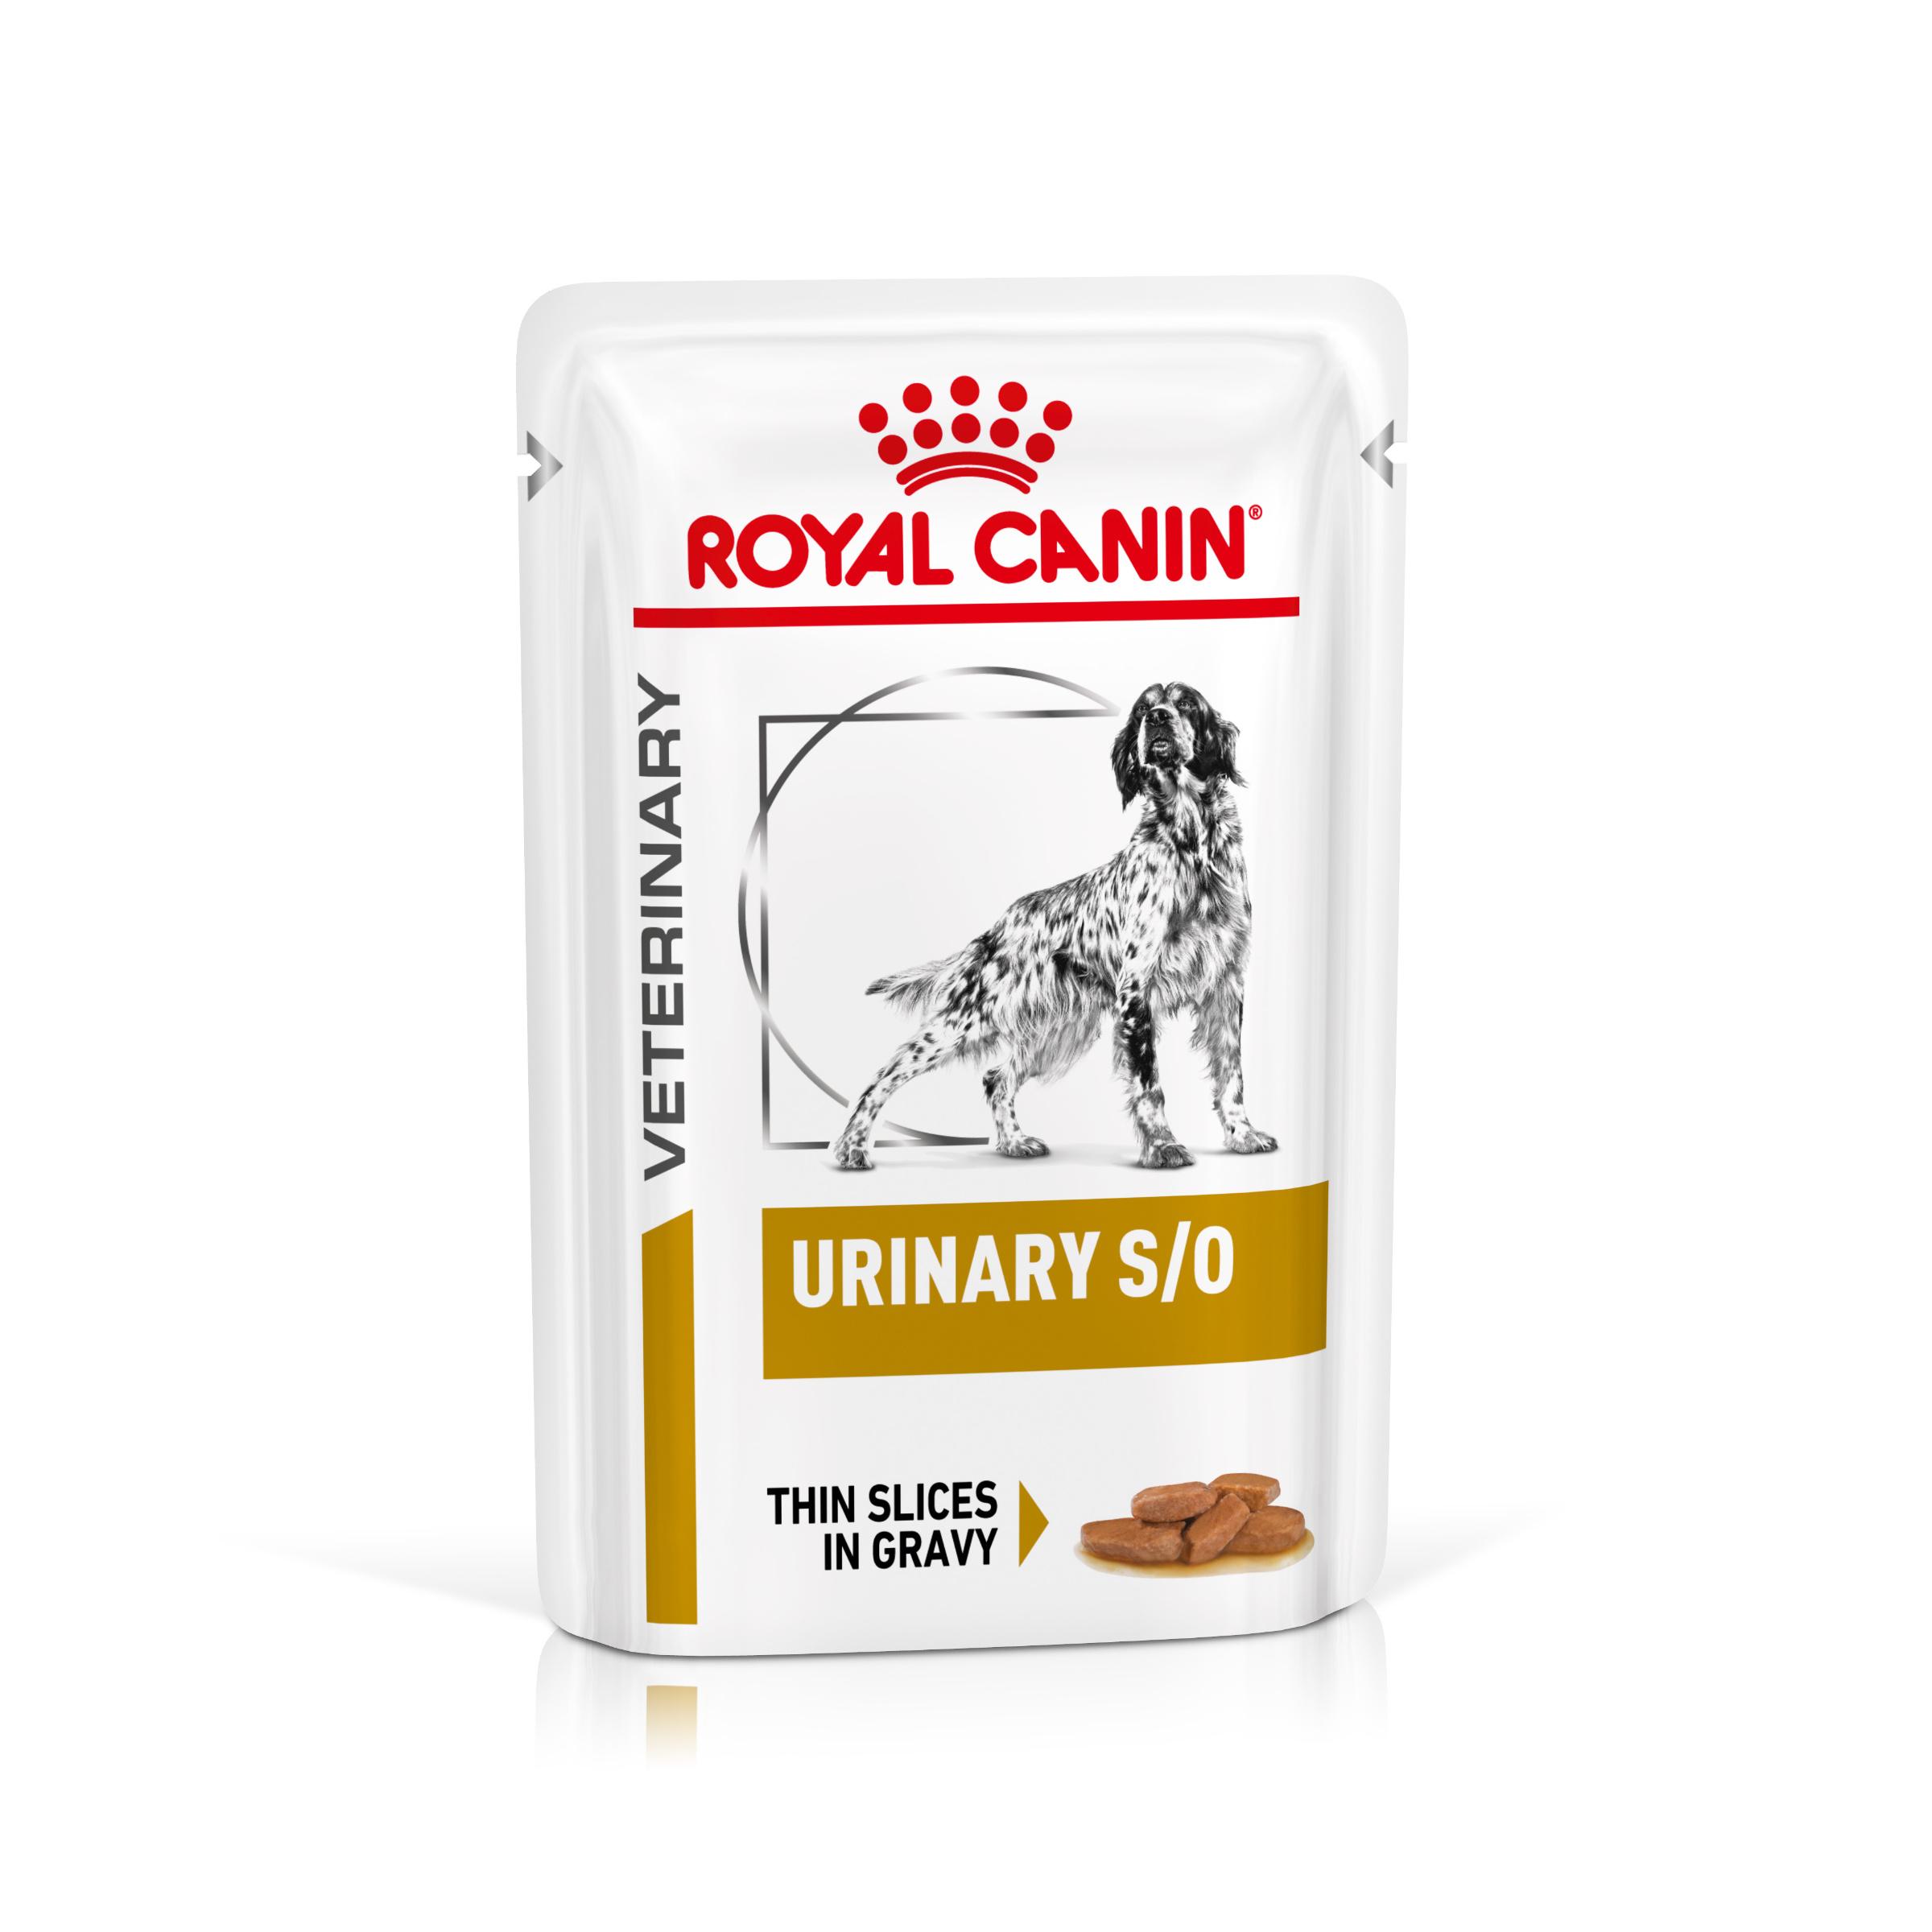 Royal canin veterinary health nutrition dog urinary s/o pouch in gravy kapsa 100g